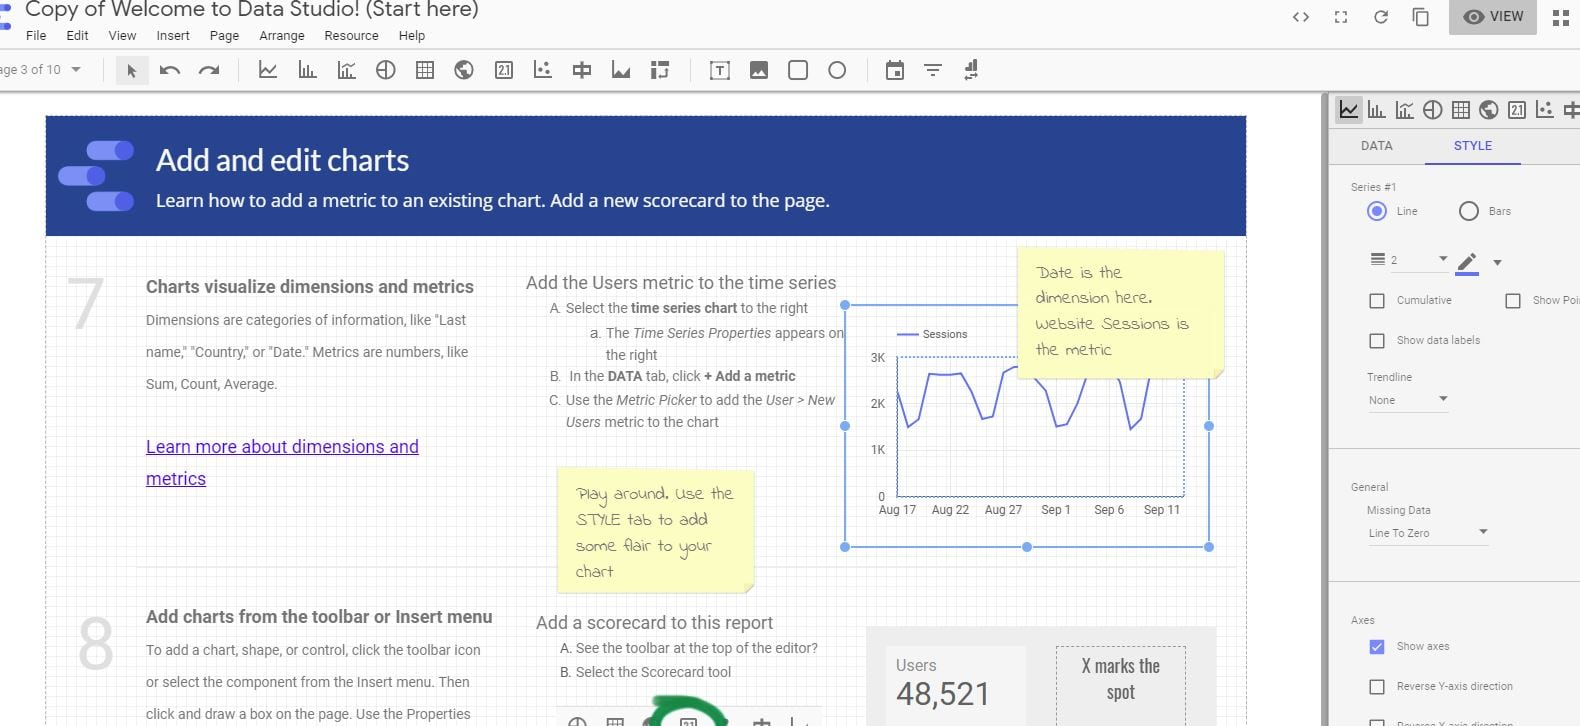 Exploring Google's Data Studio